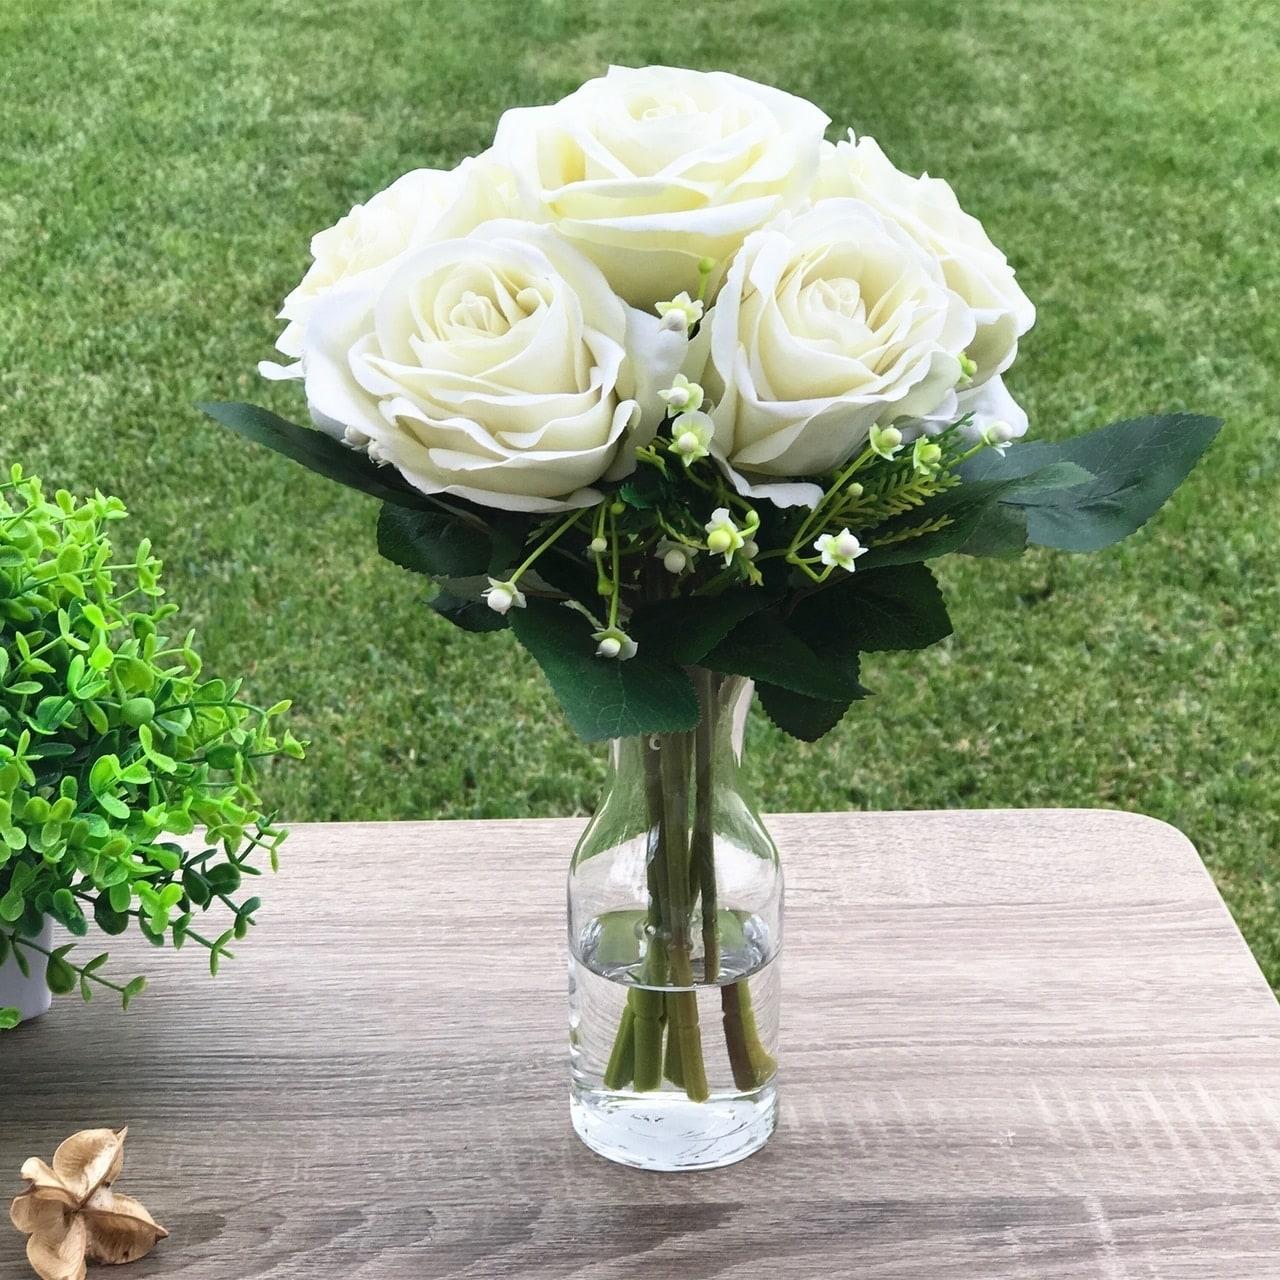 Enova Home Velet Open Rose Flower Arrangements With Clear Gl Vase